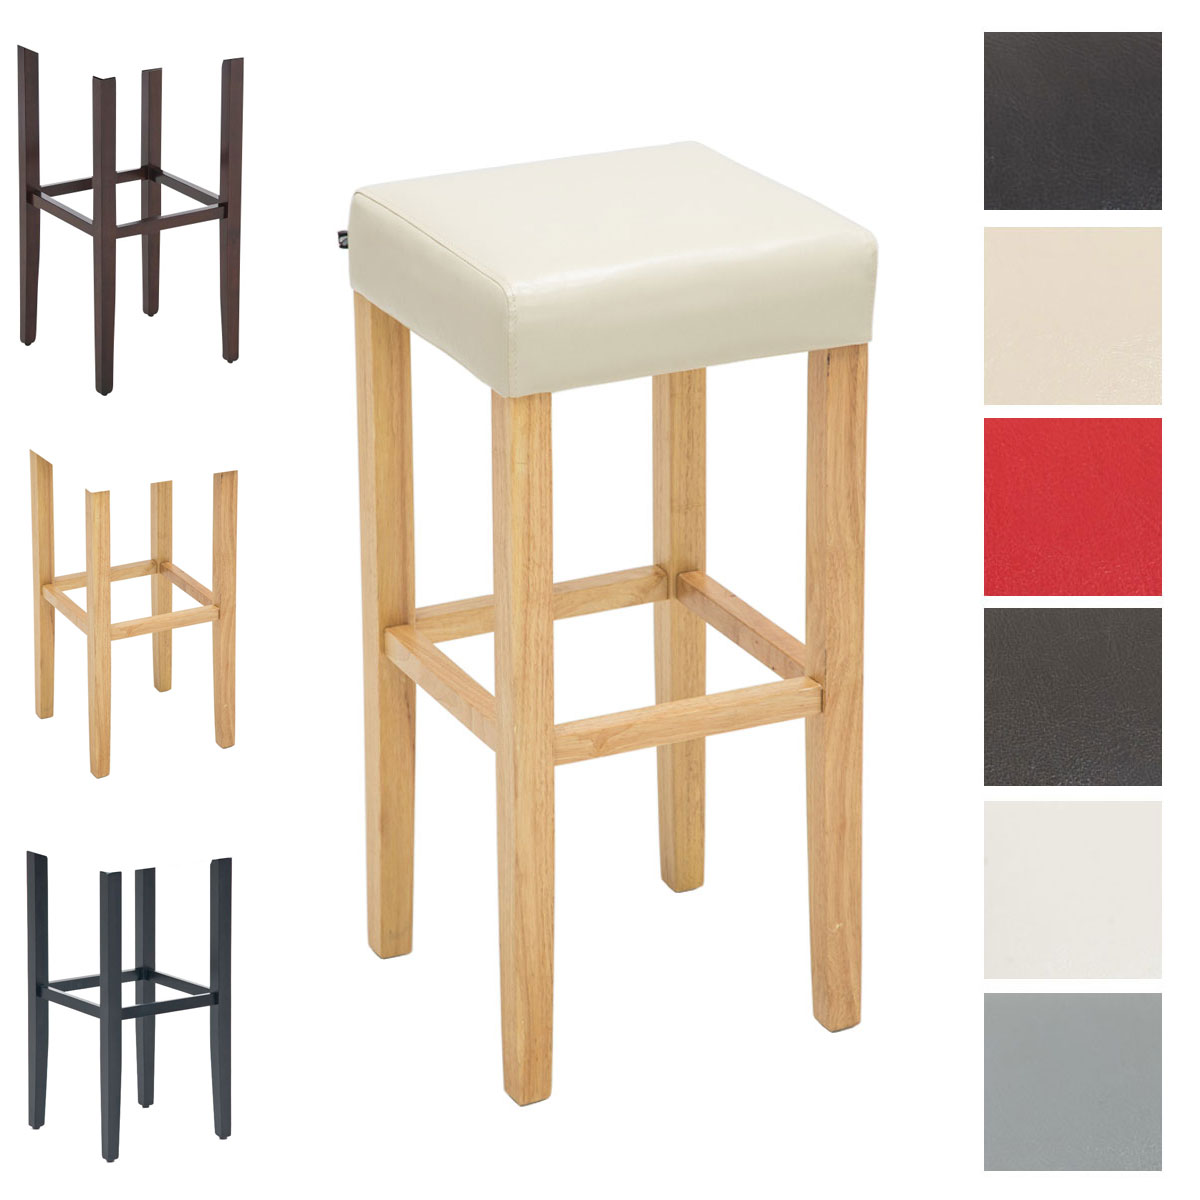 Tabouret bar JUDY chaise similicuir bois repose pied cuisine salle à manger neuf